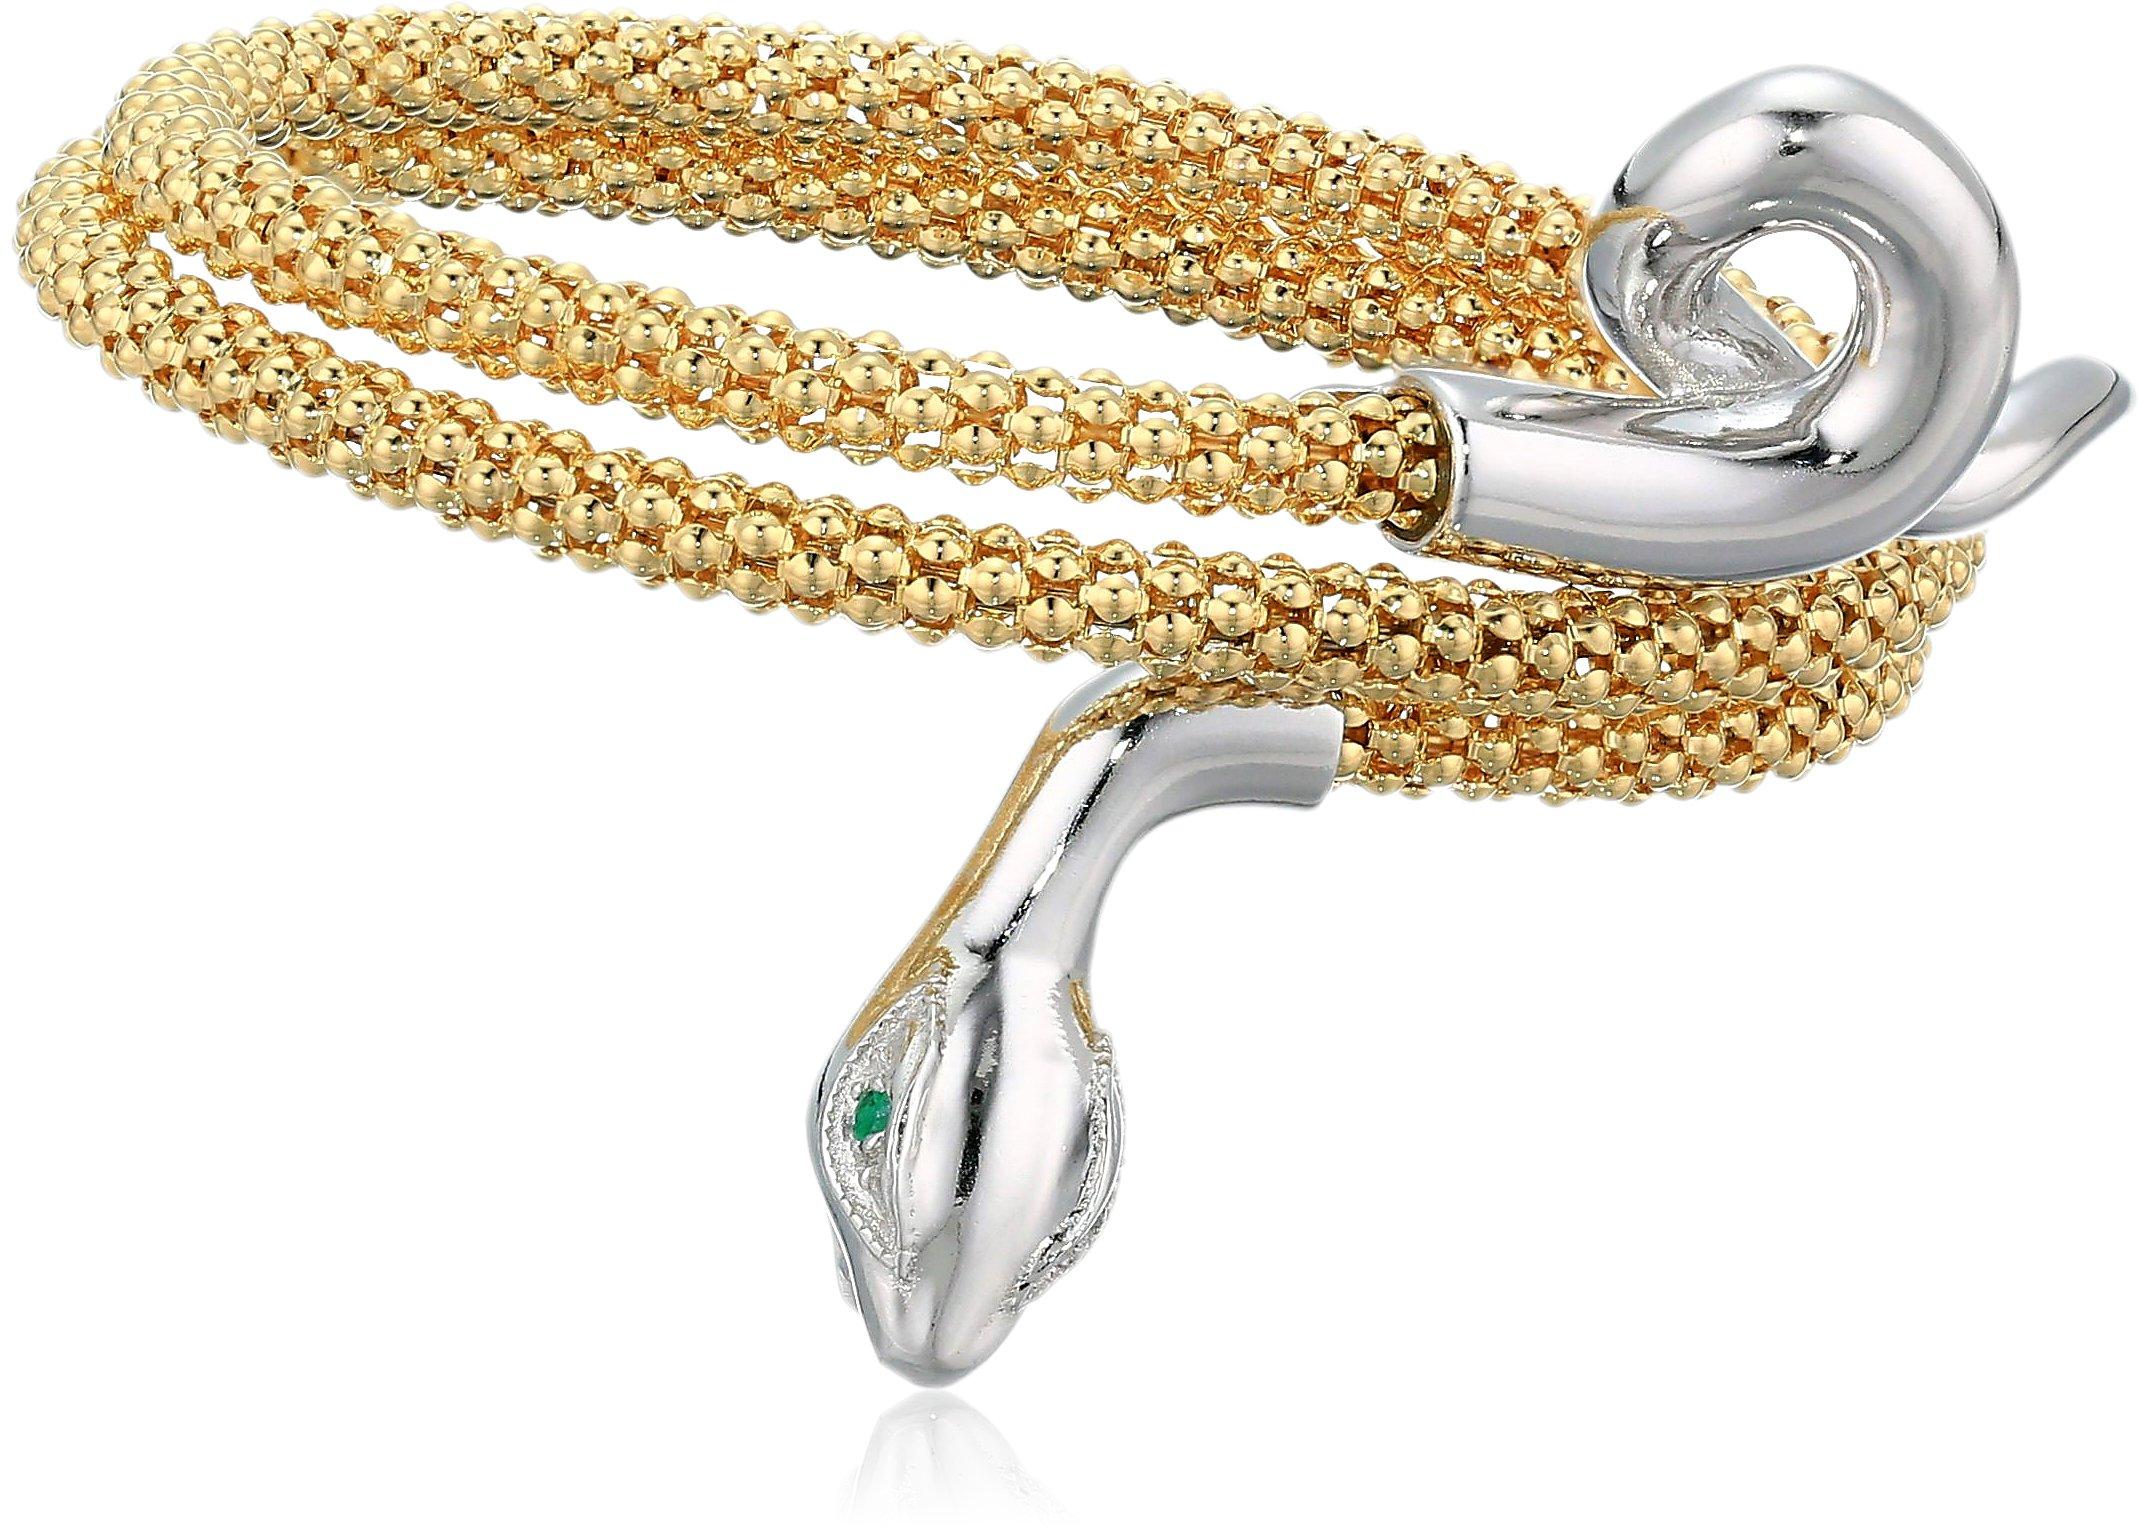 Women's 14K Yellow Gold Plated Sterling Silver And Rhodium Plated Sterling Silver Snake Bangle Wrap Bracelet